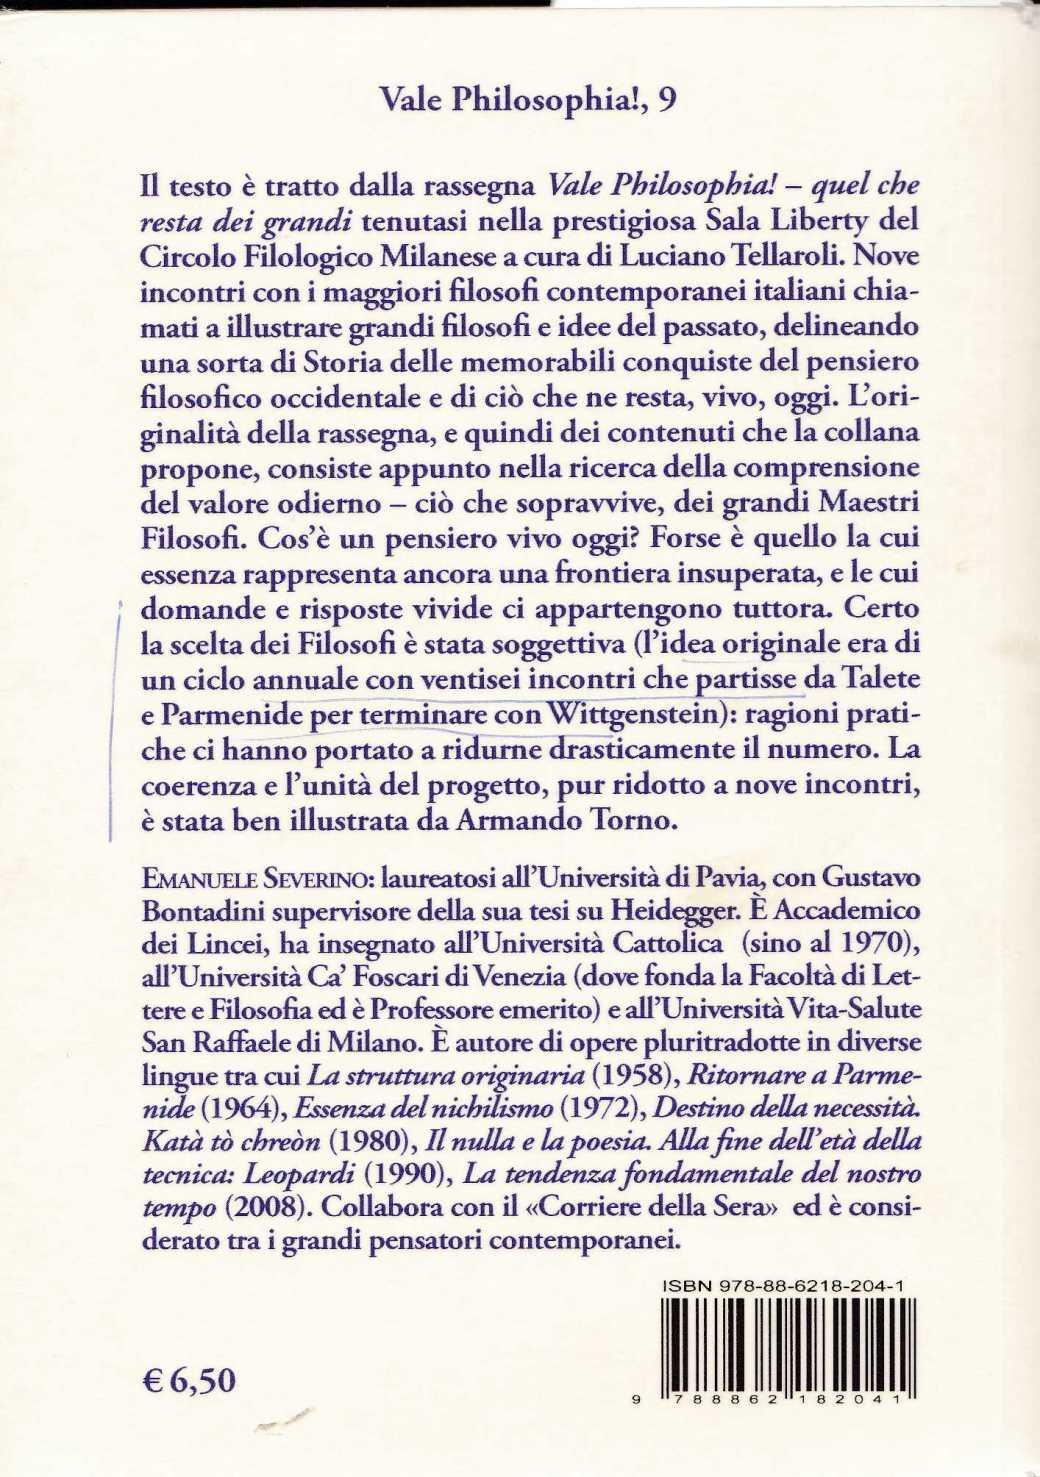 libri emanuele sevrino1928